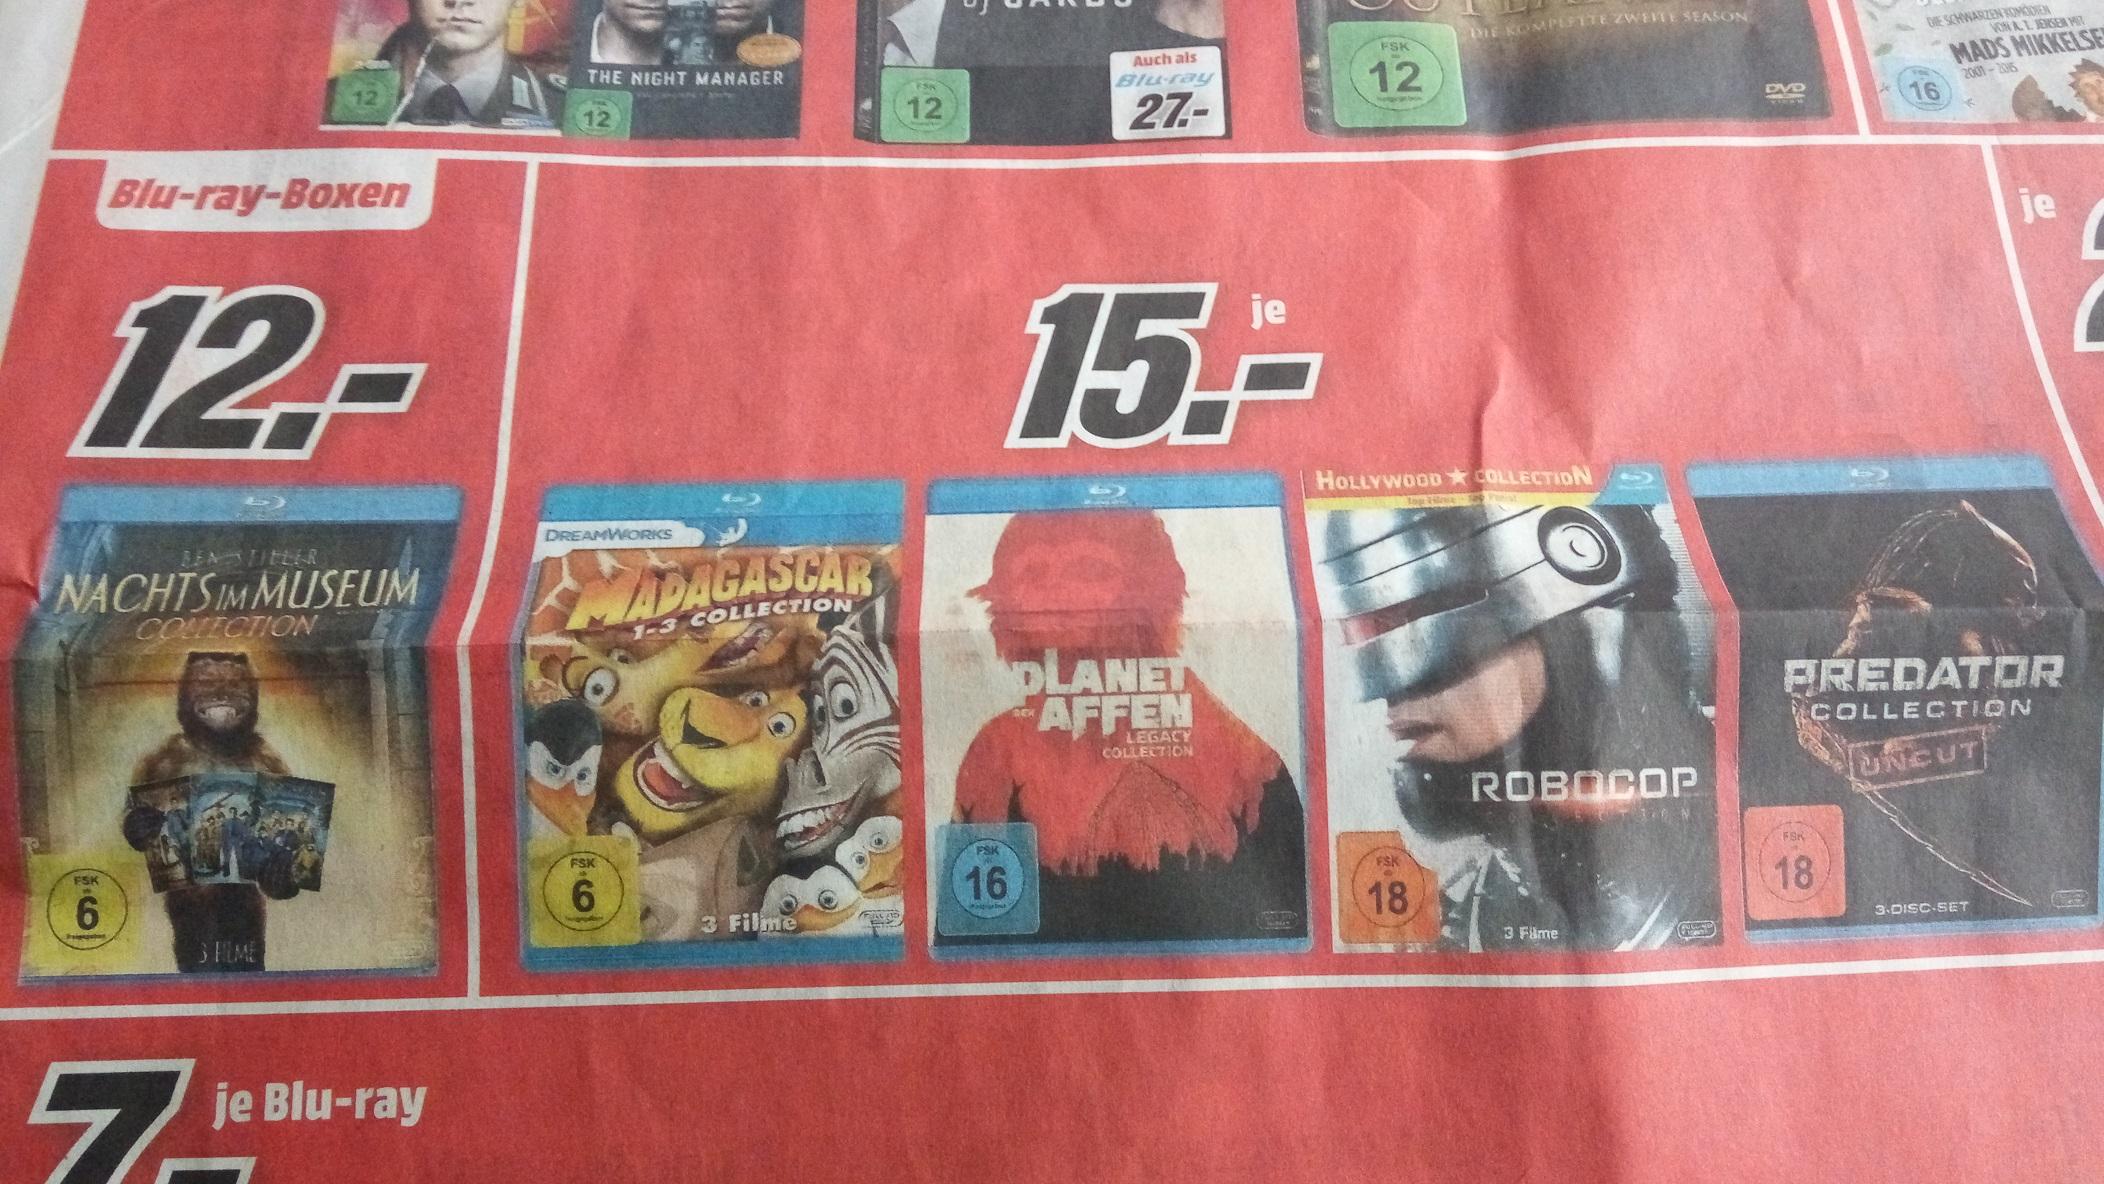 Lokal Media Markt Berlin Blu-ray Boxen Predator, Madagascar, Robocop, Planet der Affen je 15 €